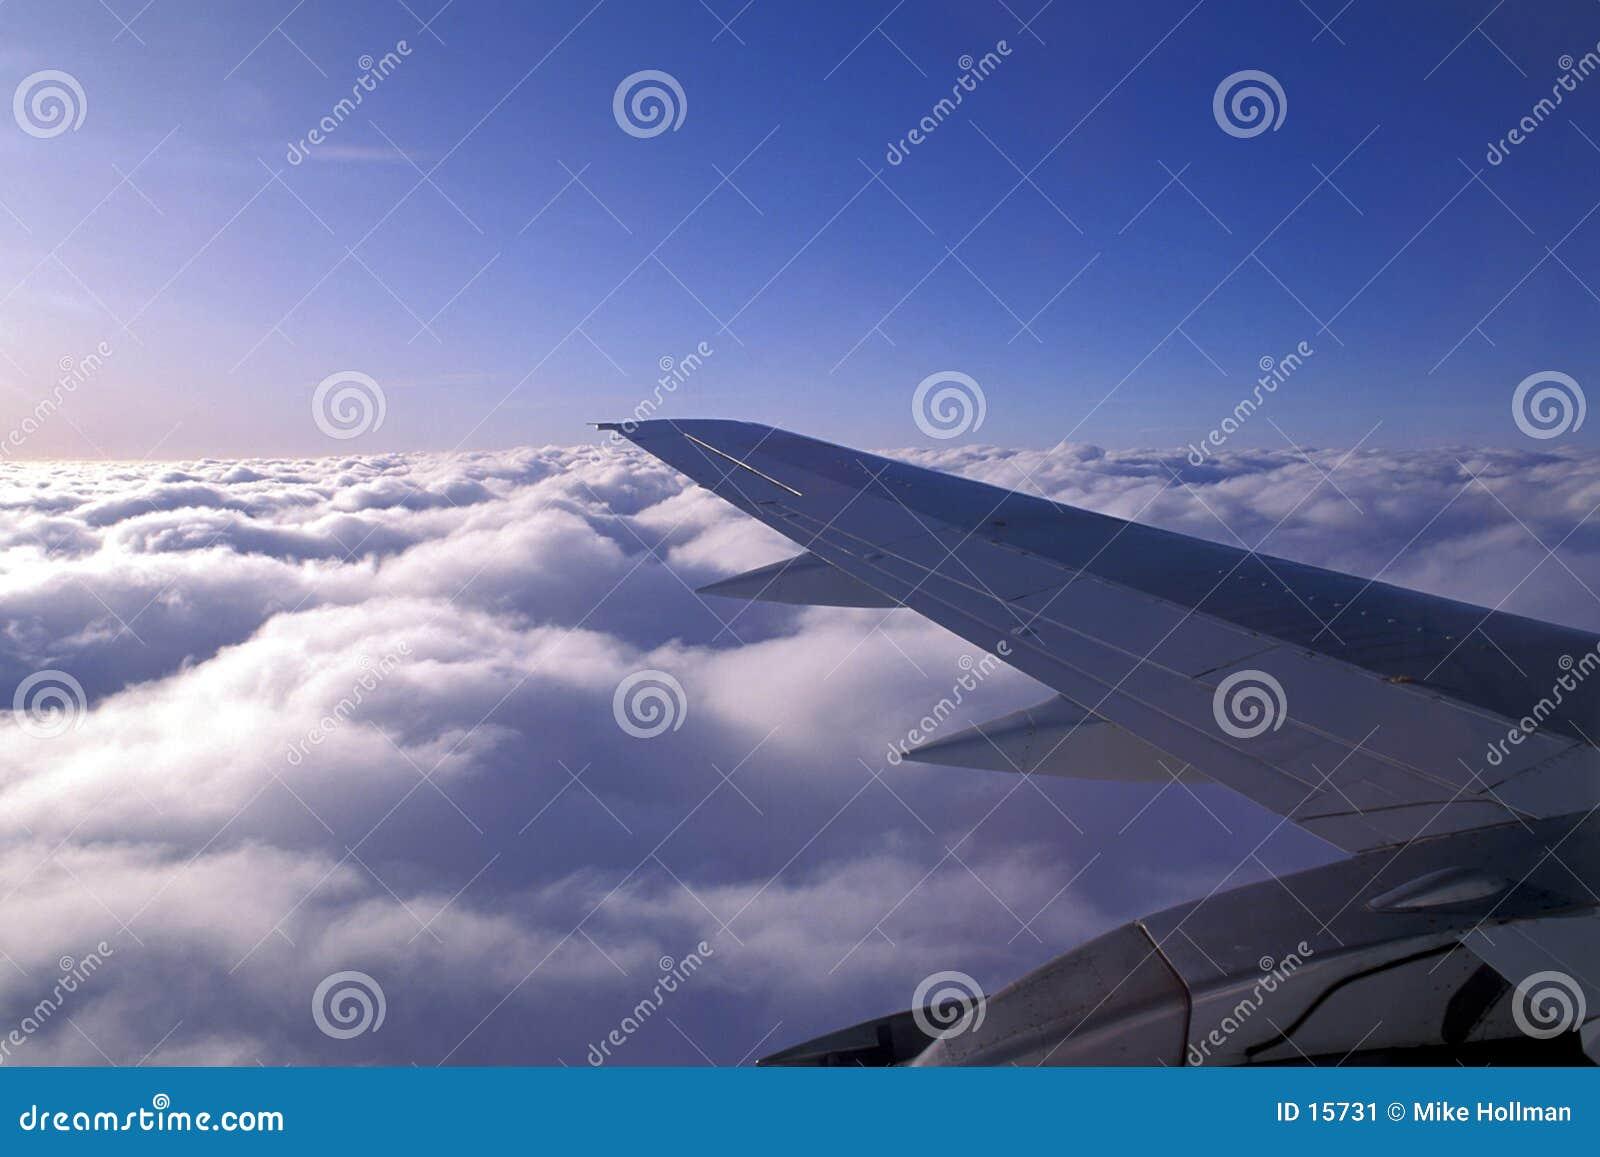 Ala de aviones